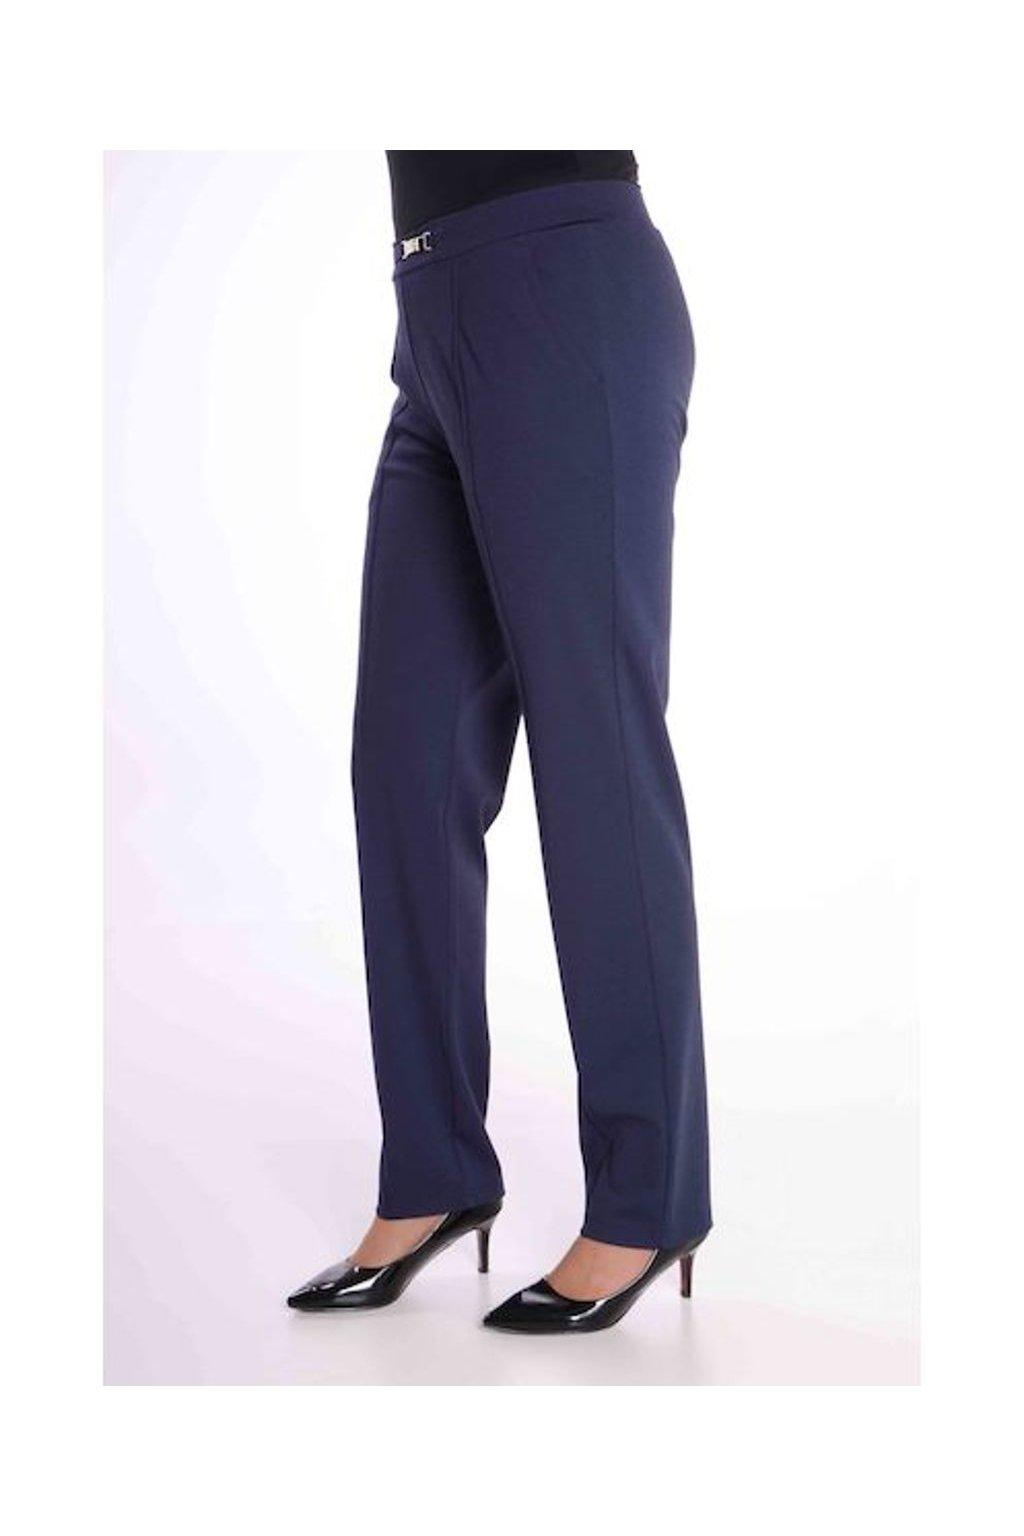 66T Kalhoty Avanti s puky (Velikost 36, Barva Modrá)